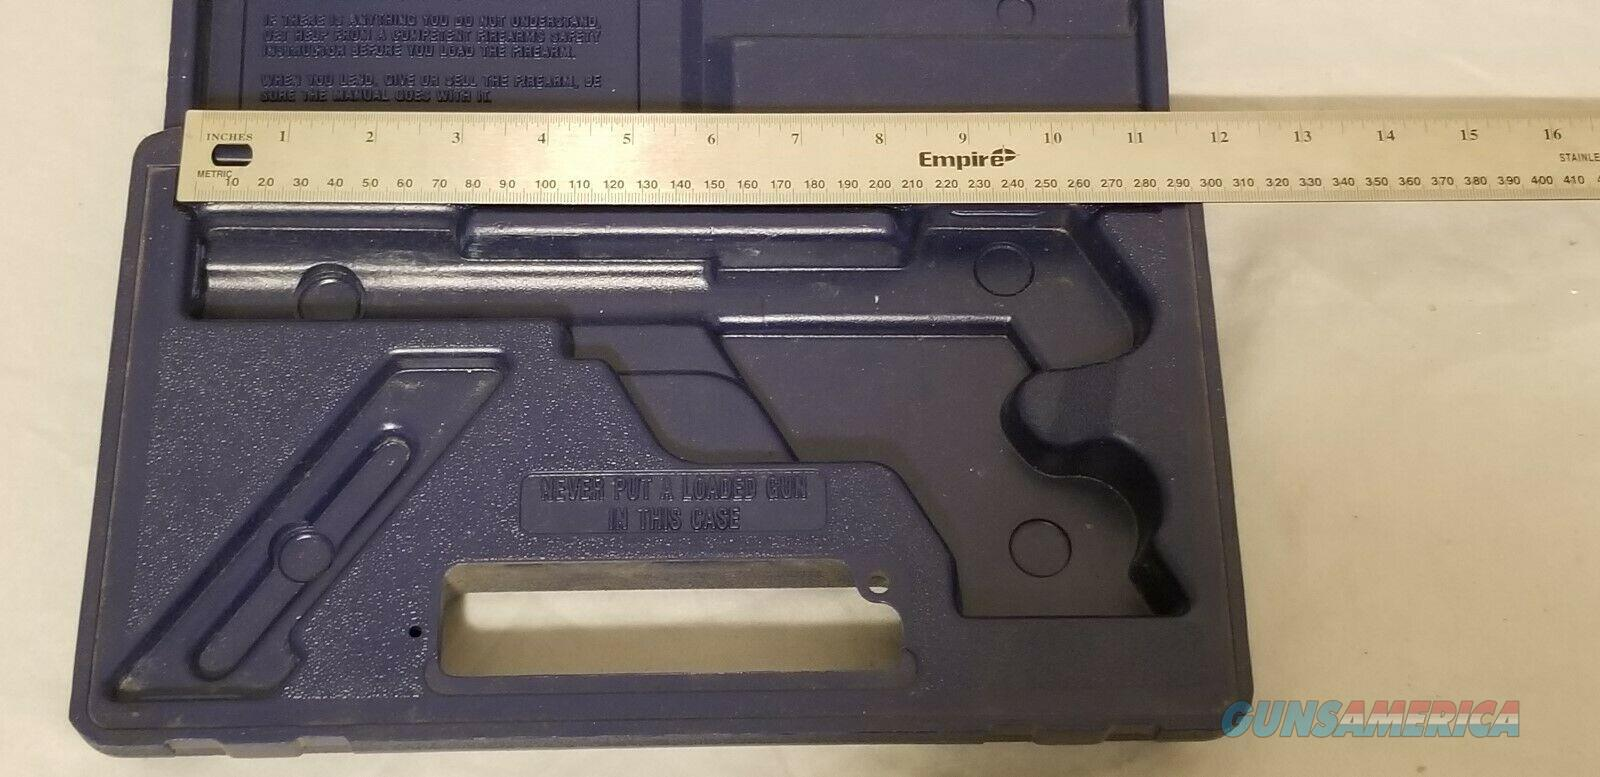 Colt .22 Cadet or Target Model Case  Non-Guns > Gun Cases